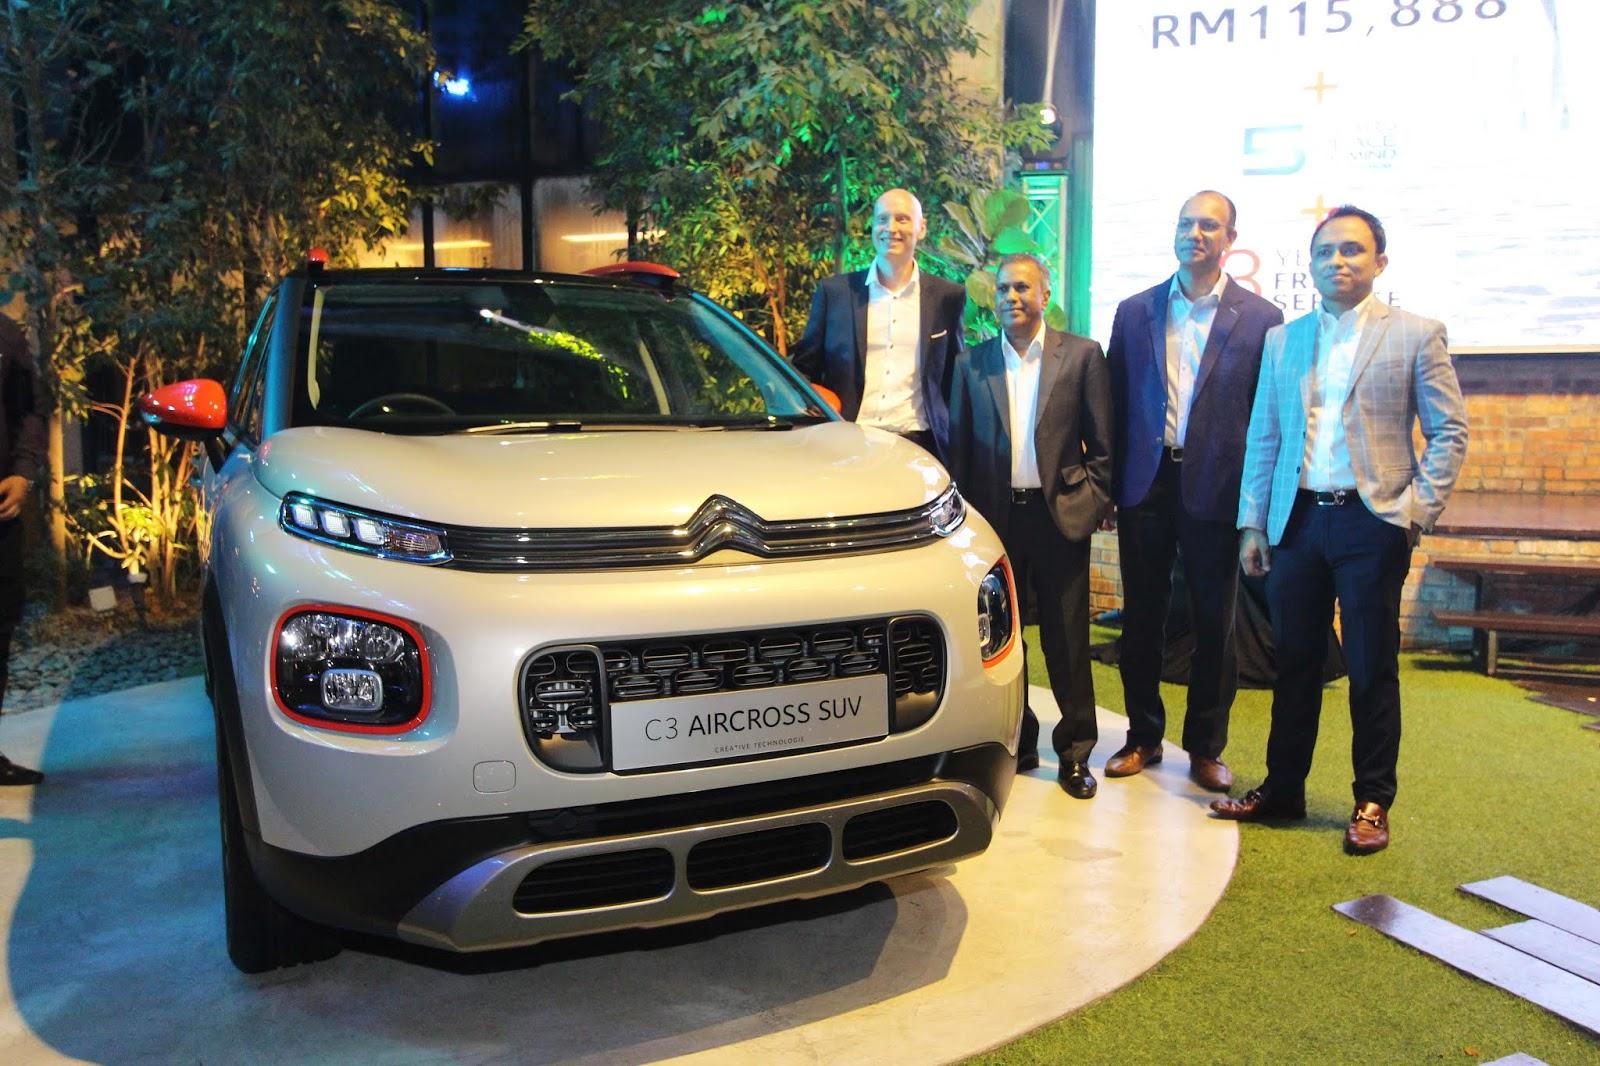 Motoring-Malaysia: 2019 Citroen C3 Aircross SUV Gets its Malaysian